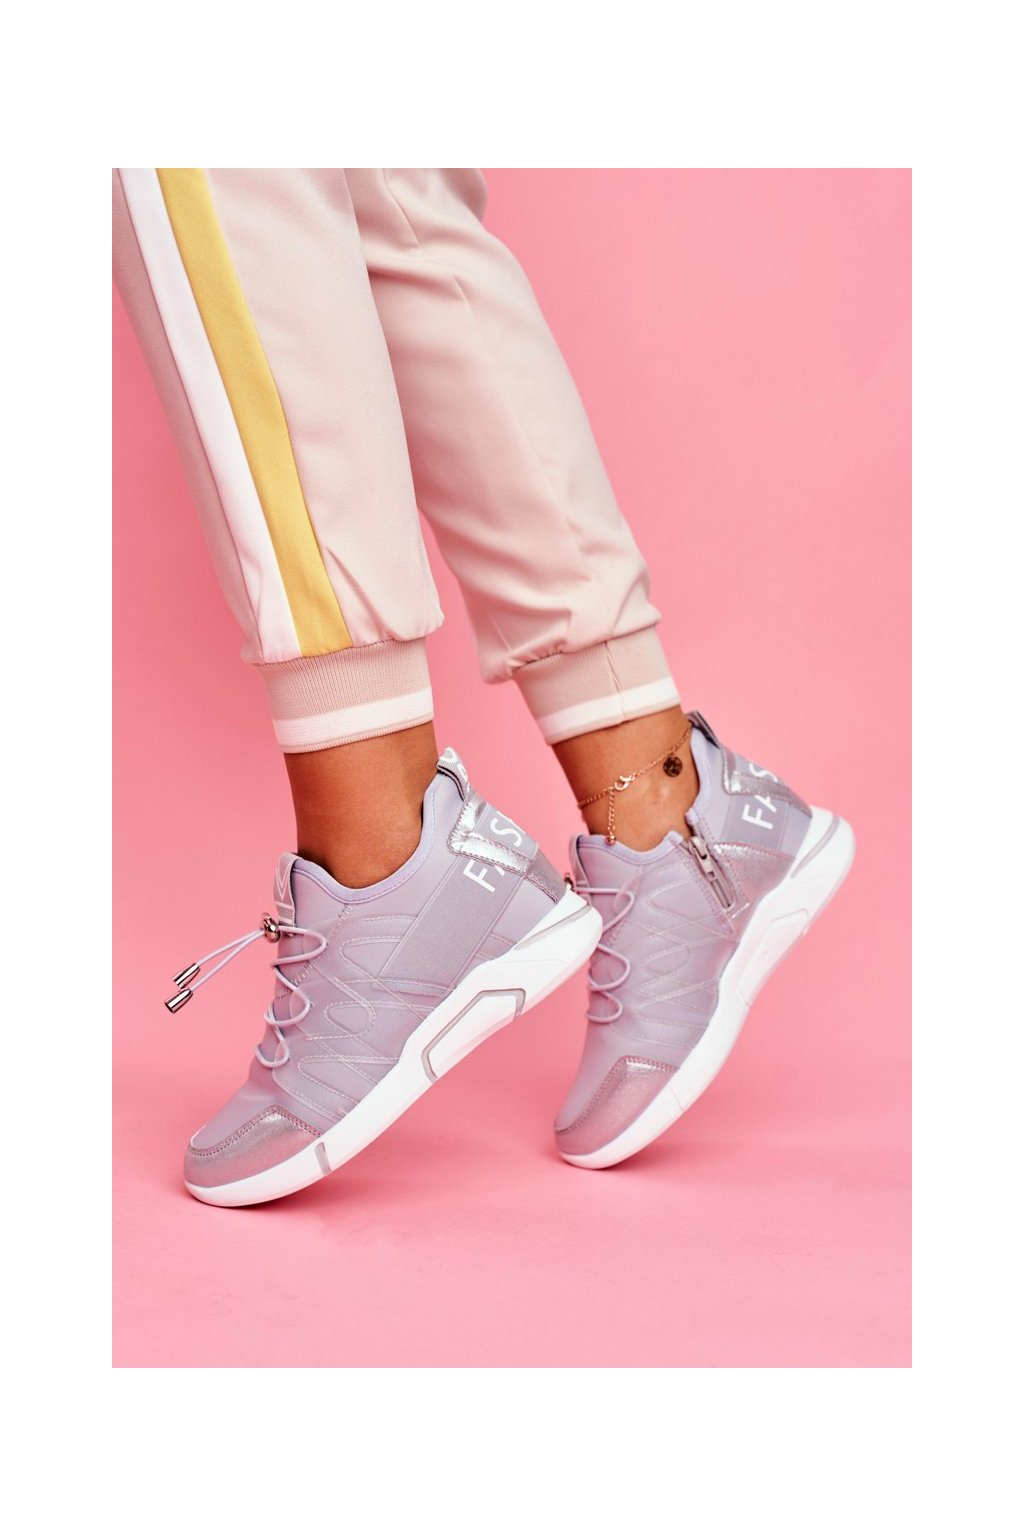 Dámska športová obuv so zipsom Šedá Terfin